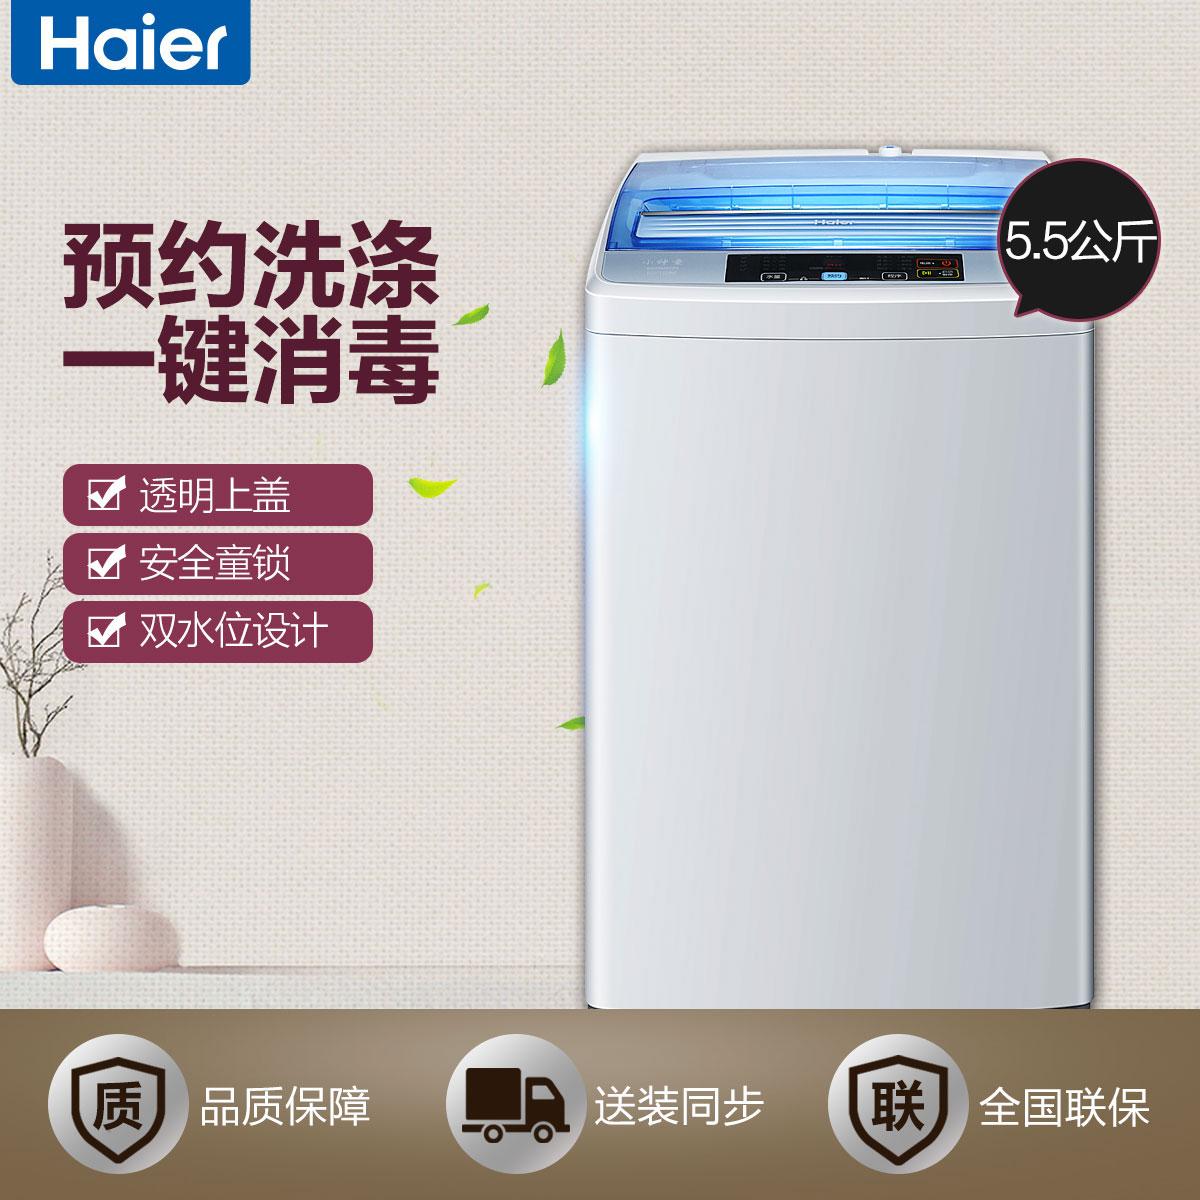 Haier/海尔 波轮洗衣机 EB55M2WH